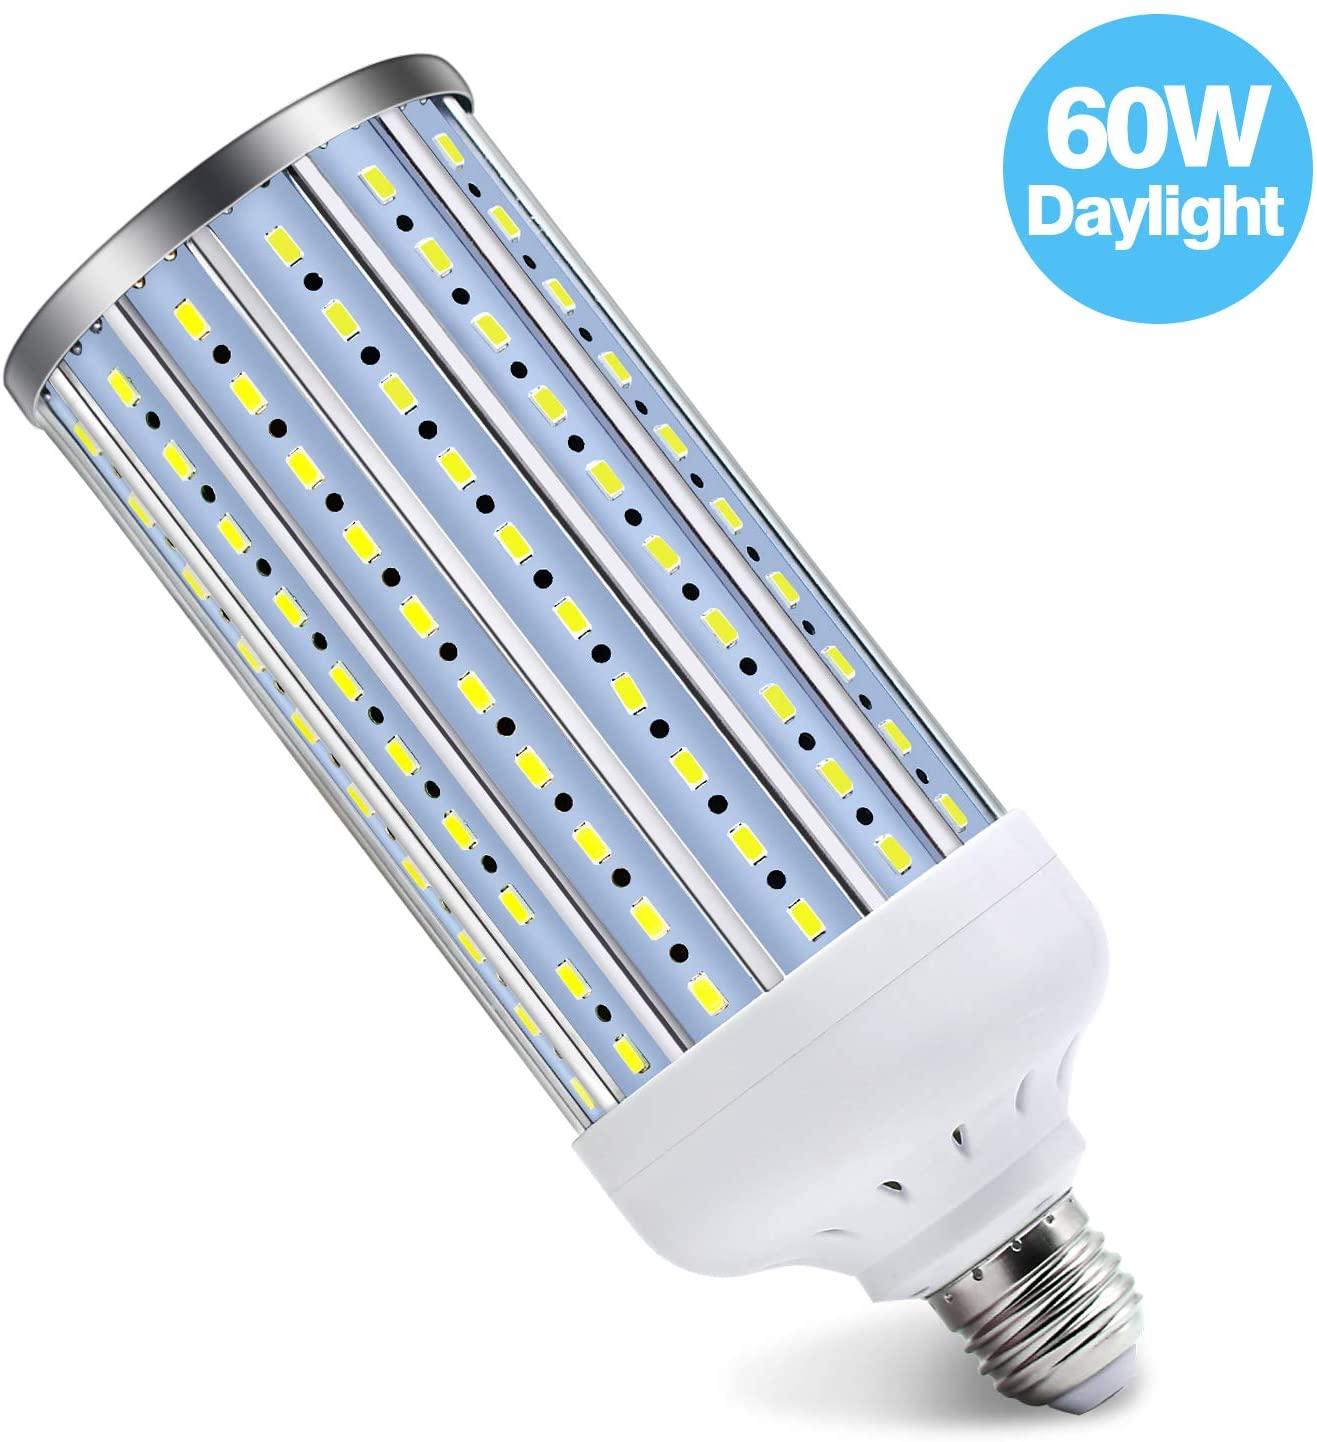 Solarlang LED Corn Light Bulb, 60W, 6500K Daylight White, 5500 Lumen(500W Equivalent) E26/E27 Medium Base, for Indoor Outdoor Large Area Lighting, Garage Factory Warehouse Backyard, Basement